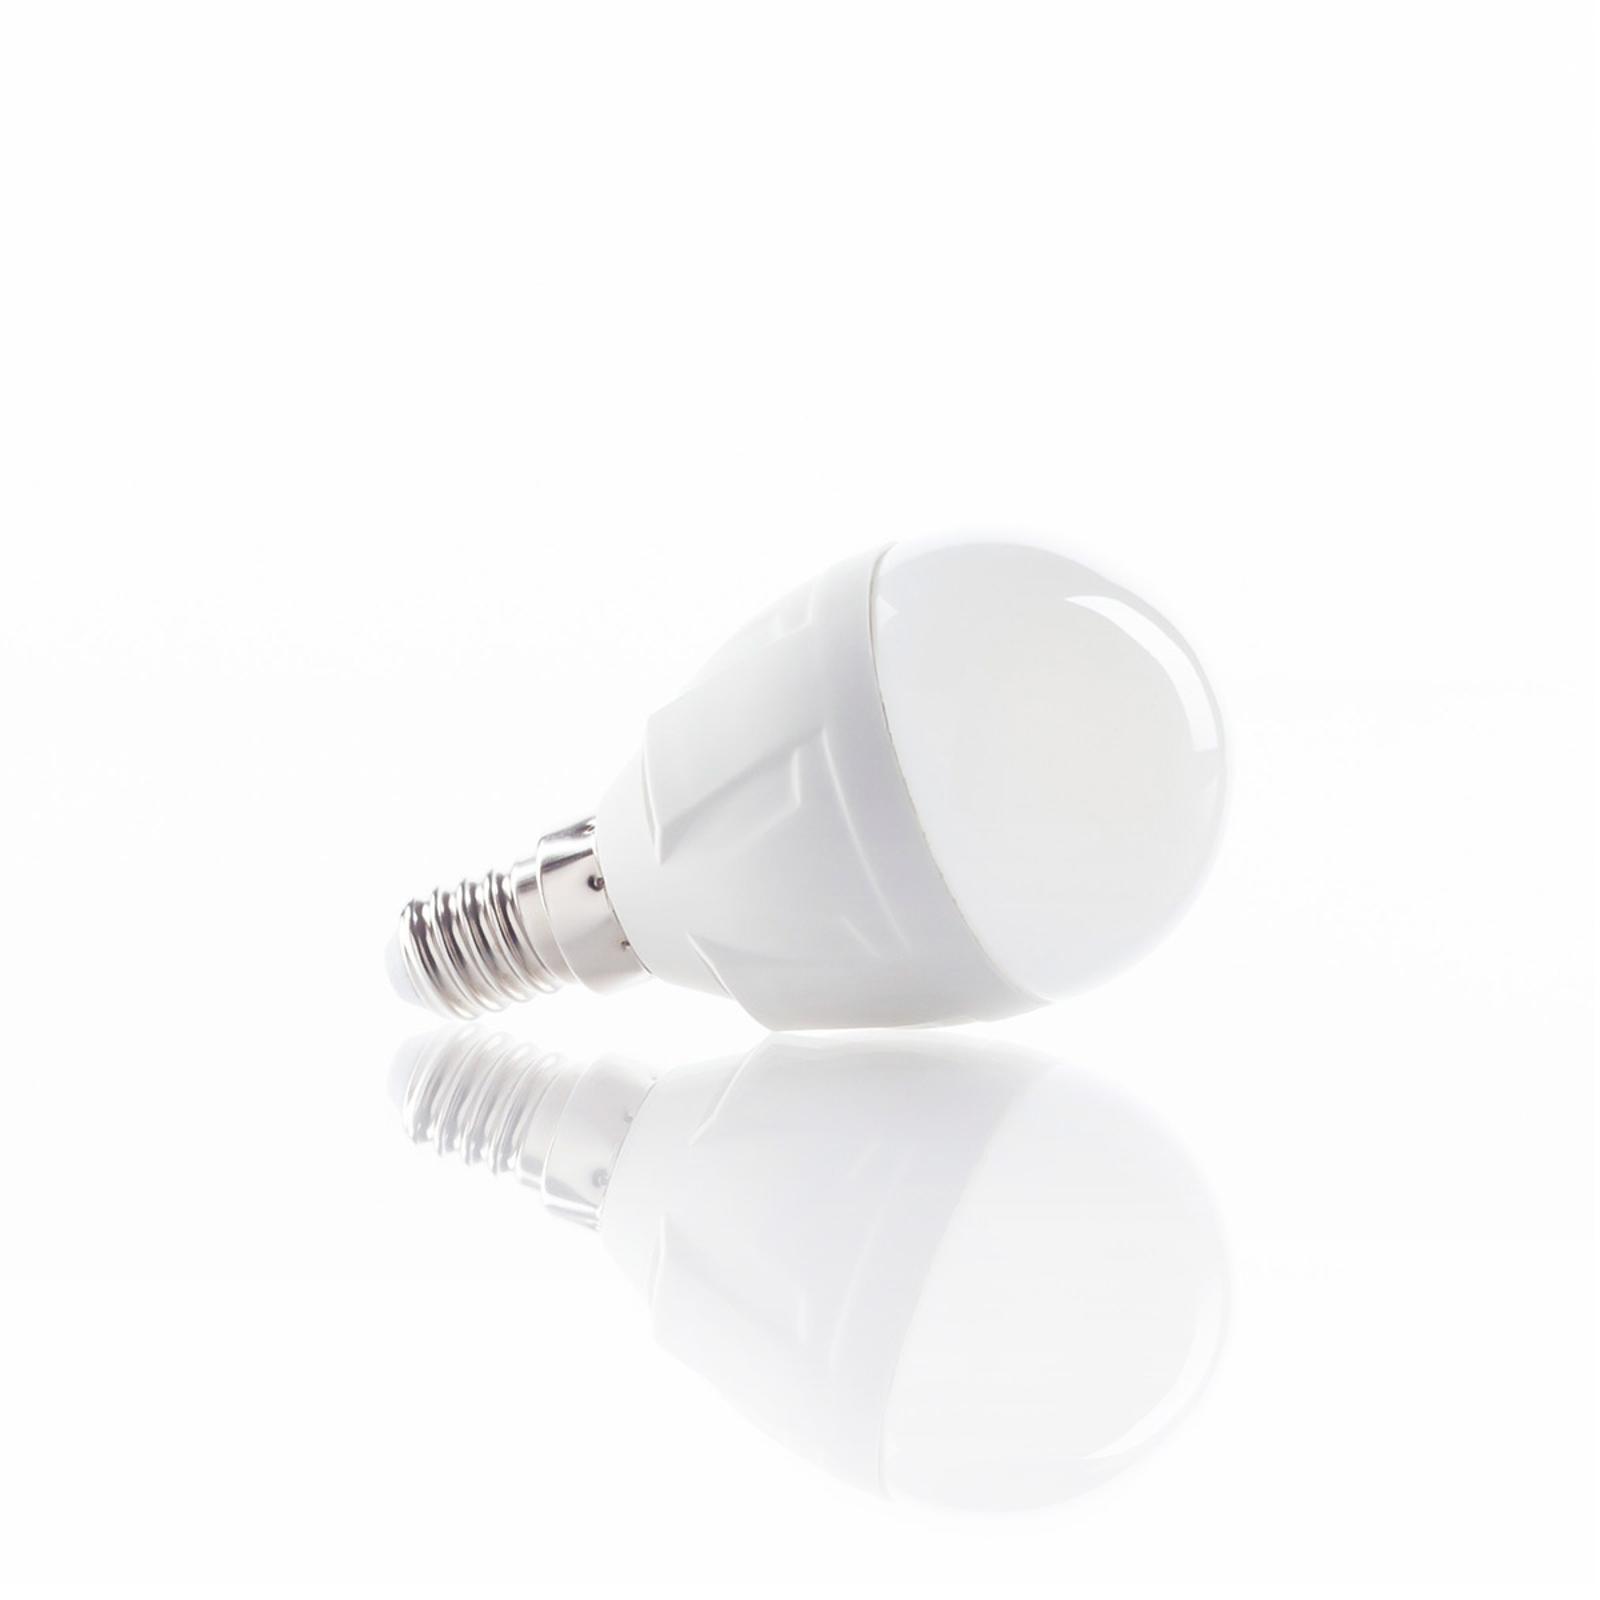 E14 6W 830 golf ball LED bulb warm white_9993007_1